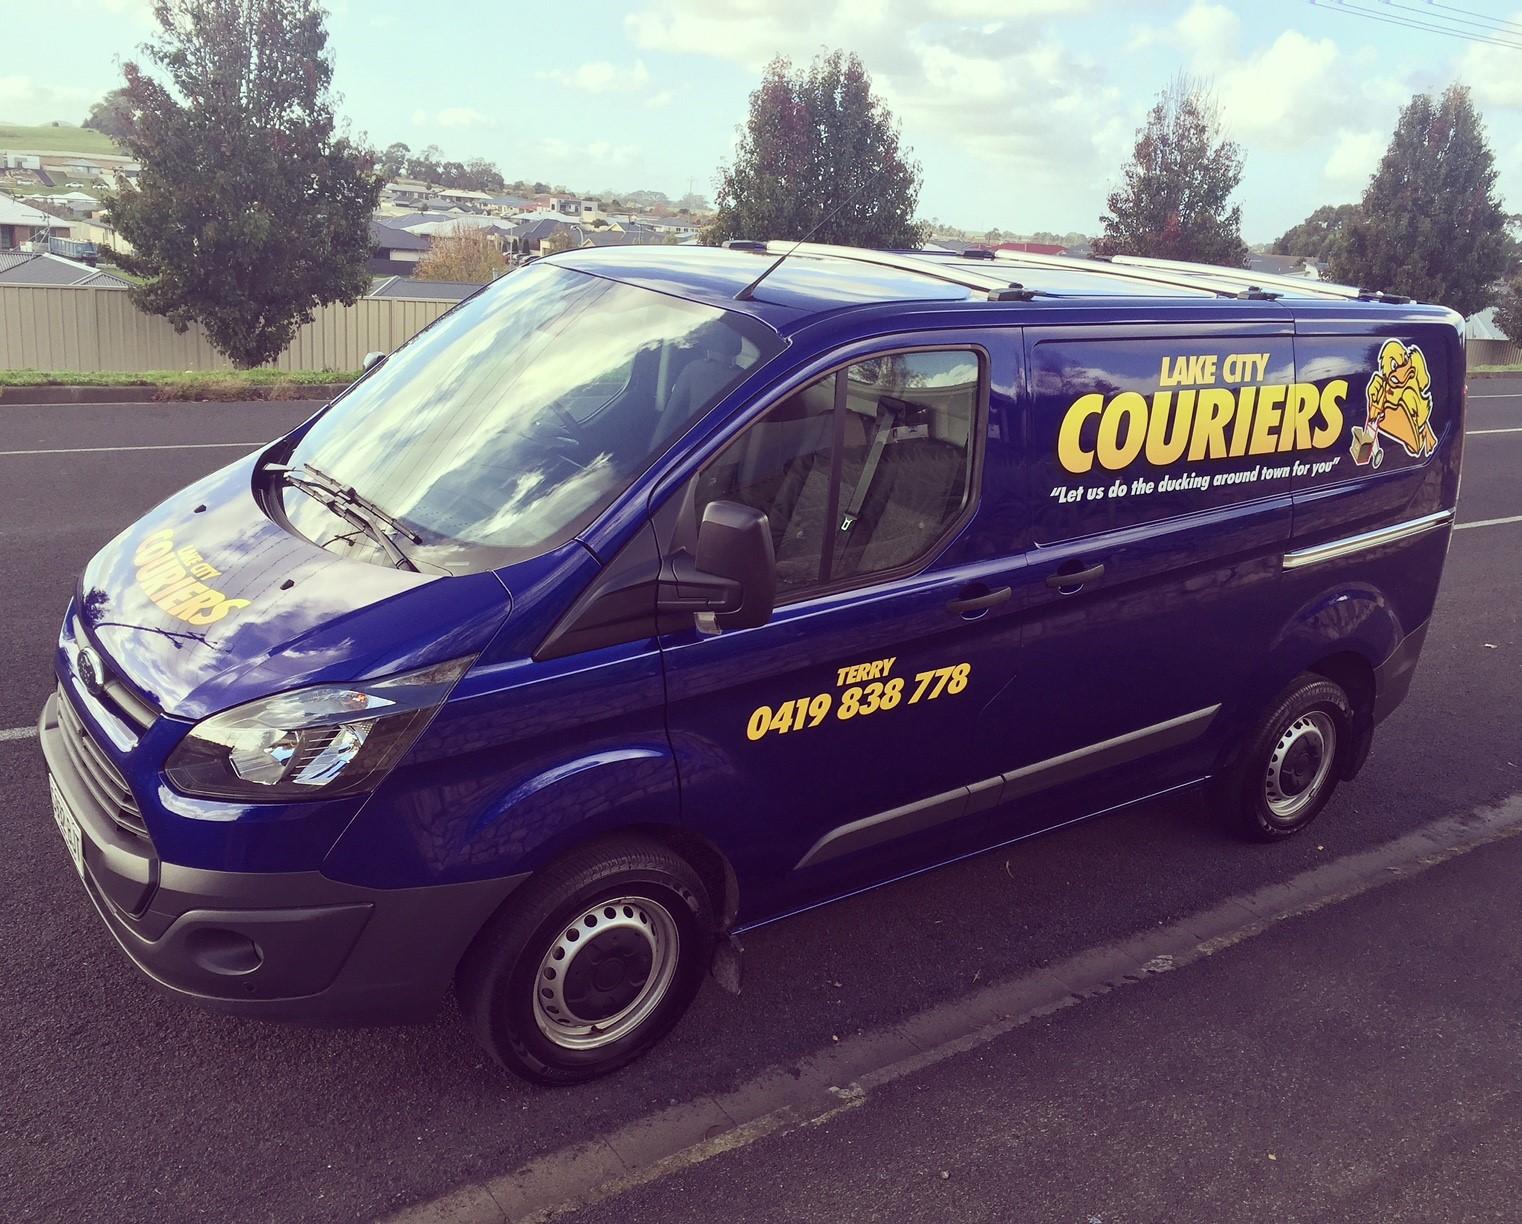 Lake City Couriers Van